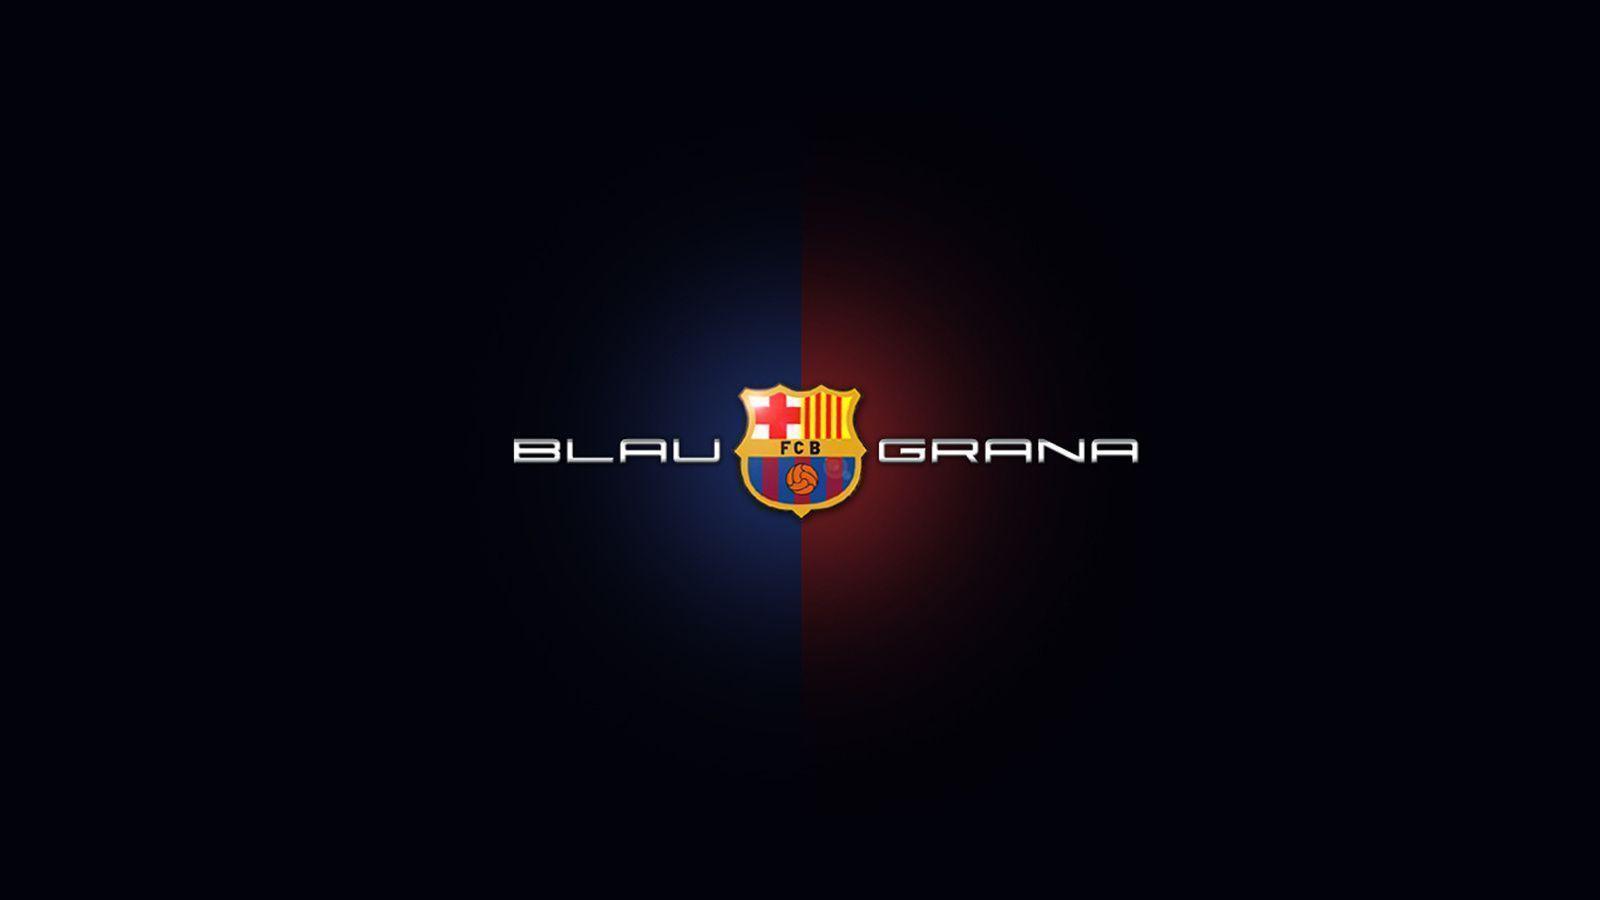 Barcelona Logo Wallpaper Background | Download High Quality ...